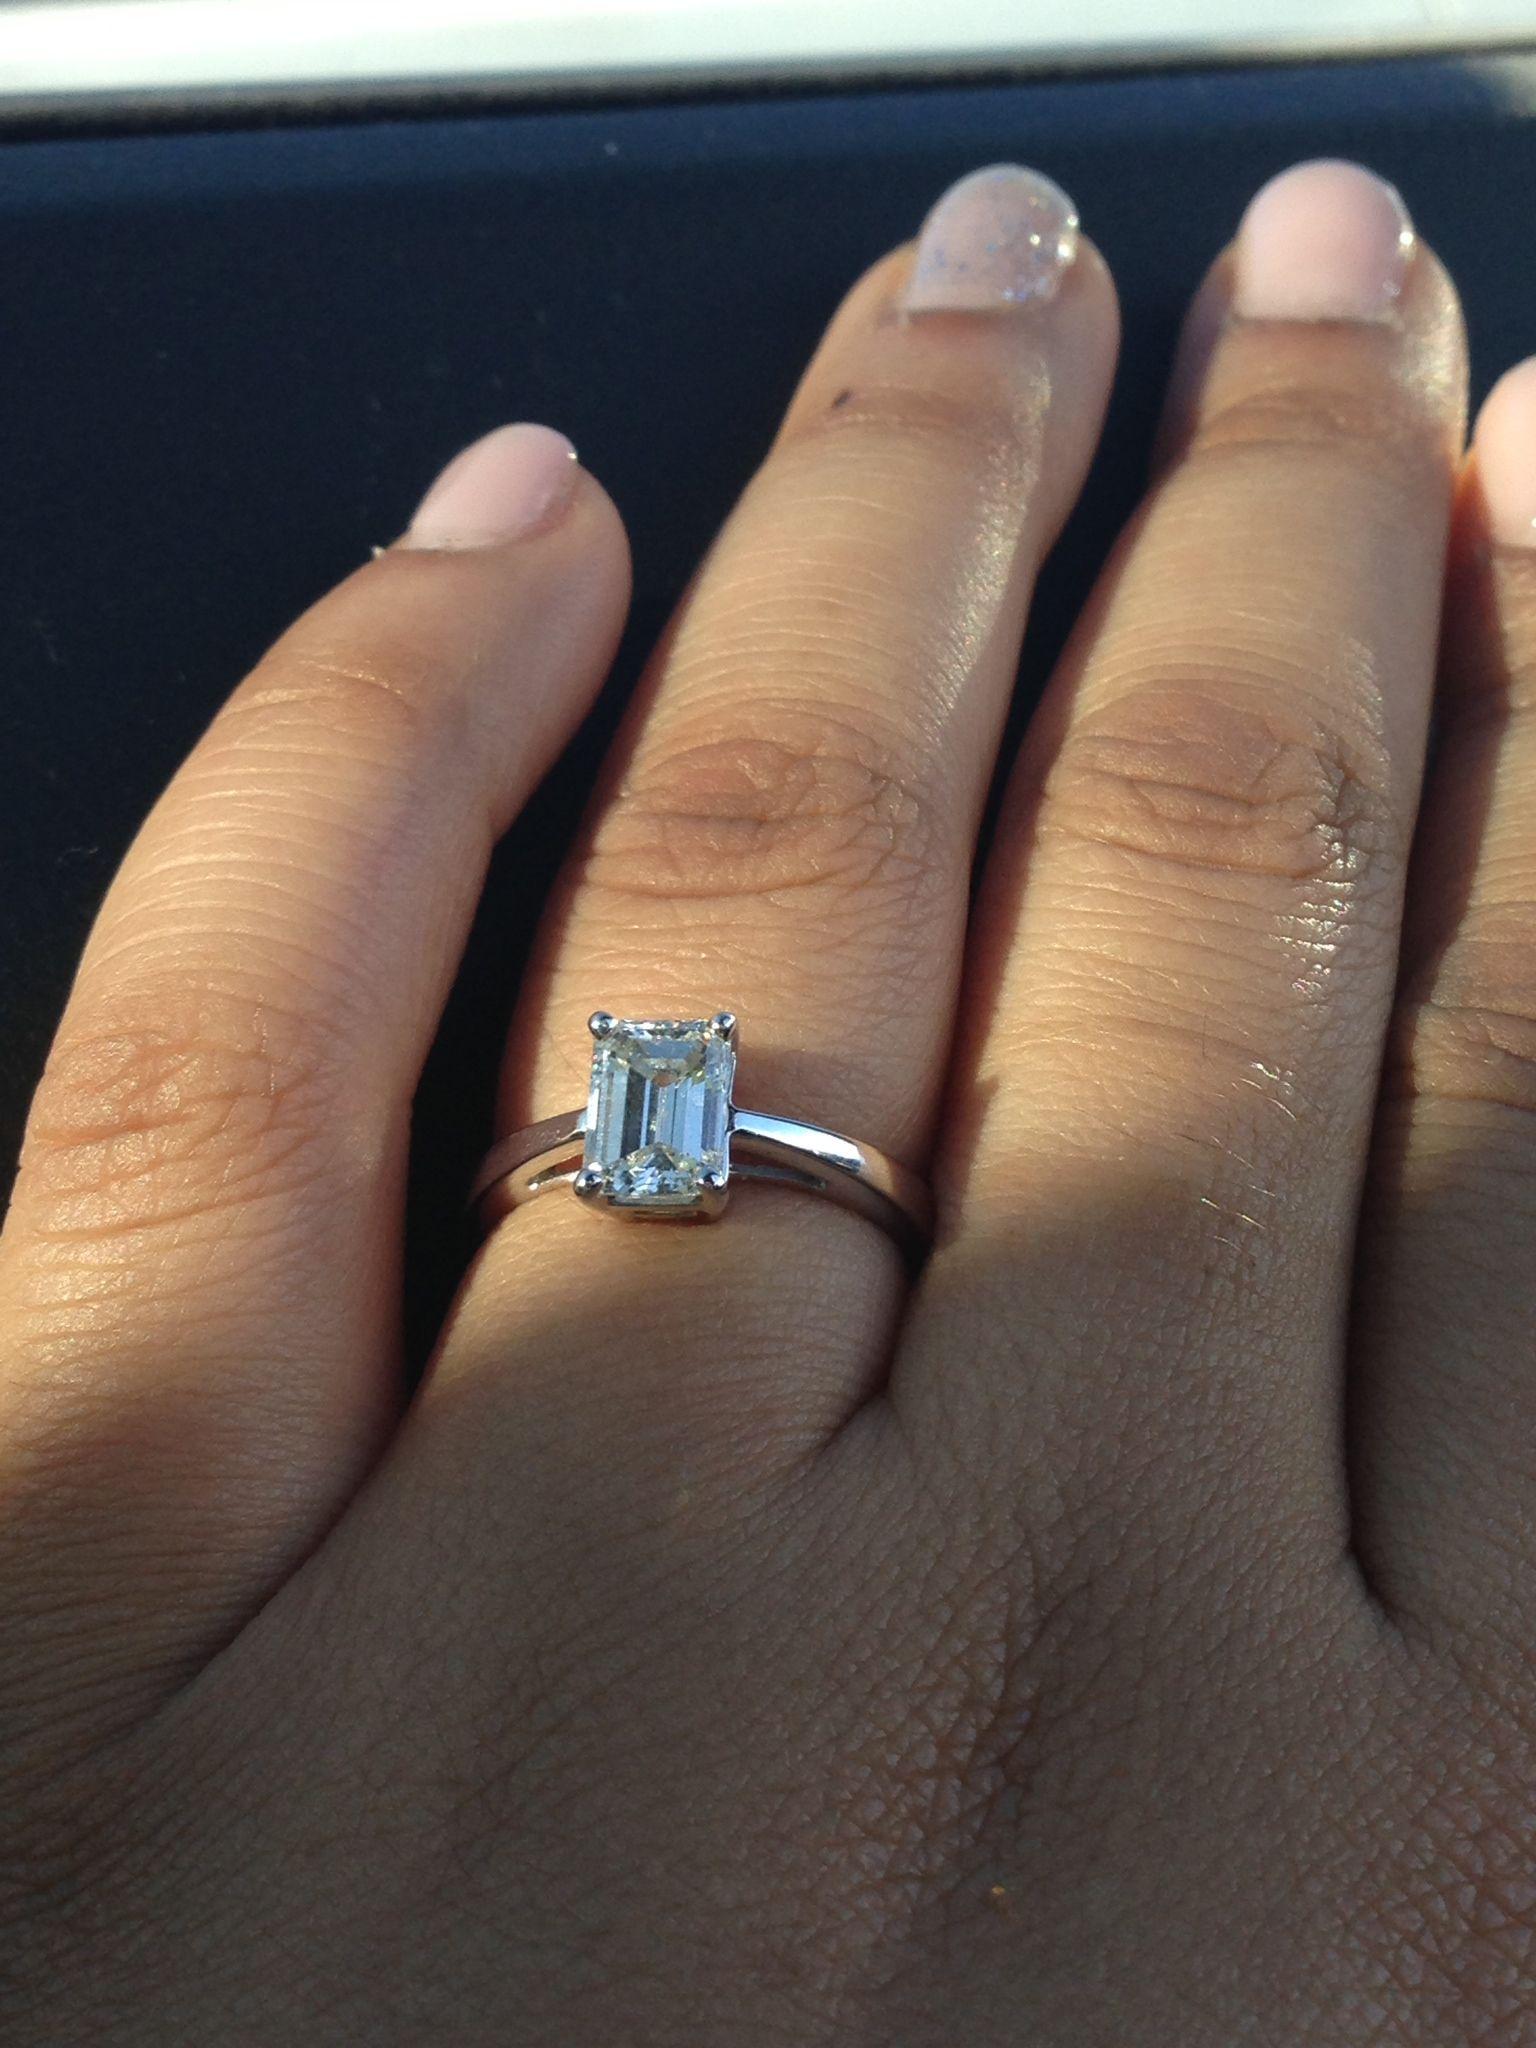 Simple, elegant, timeless. My dream engagement ring.